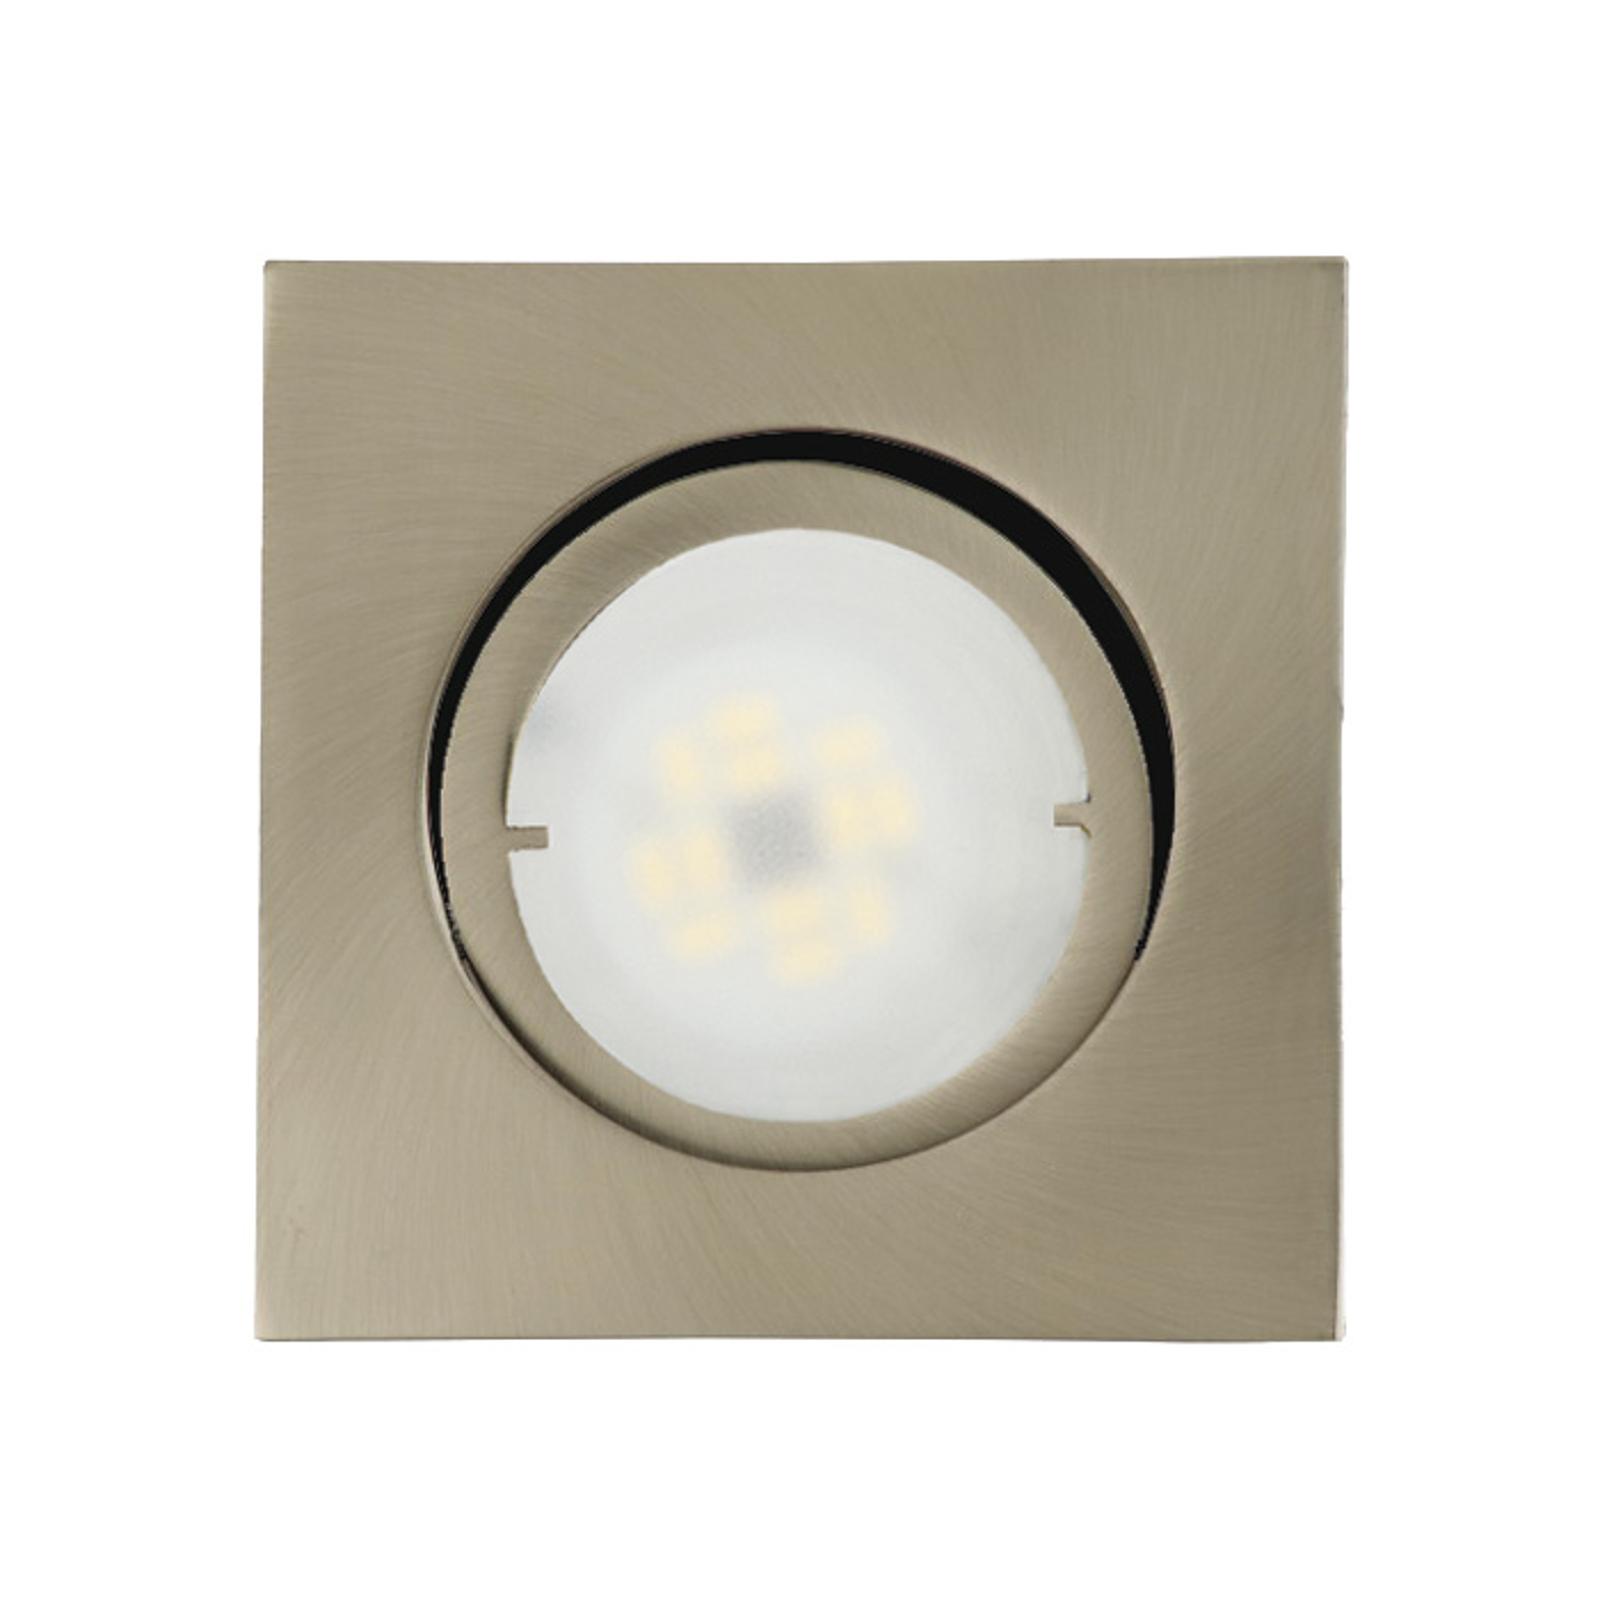 Joanie - LED-inbyggnadslampa, borstat järn